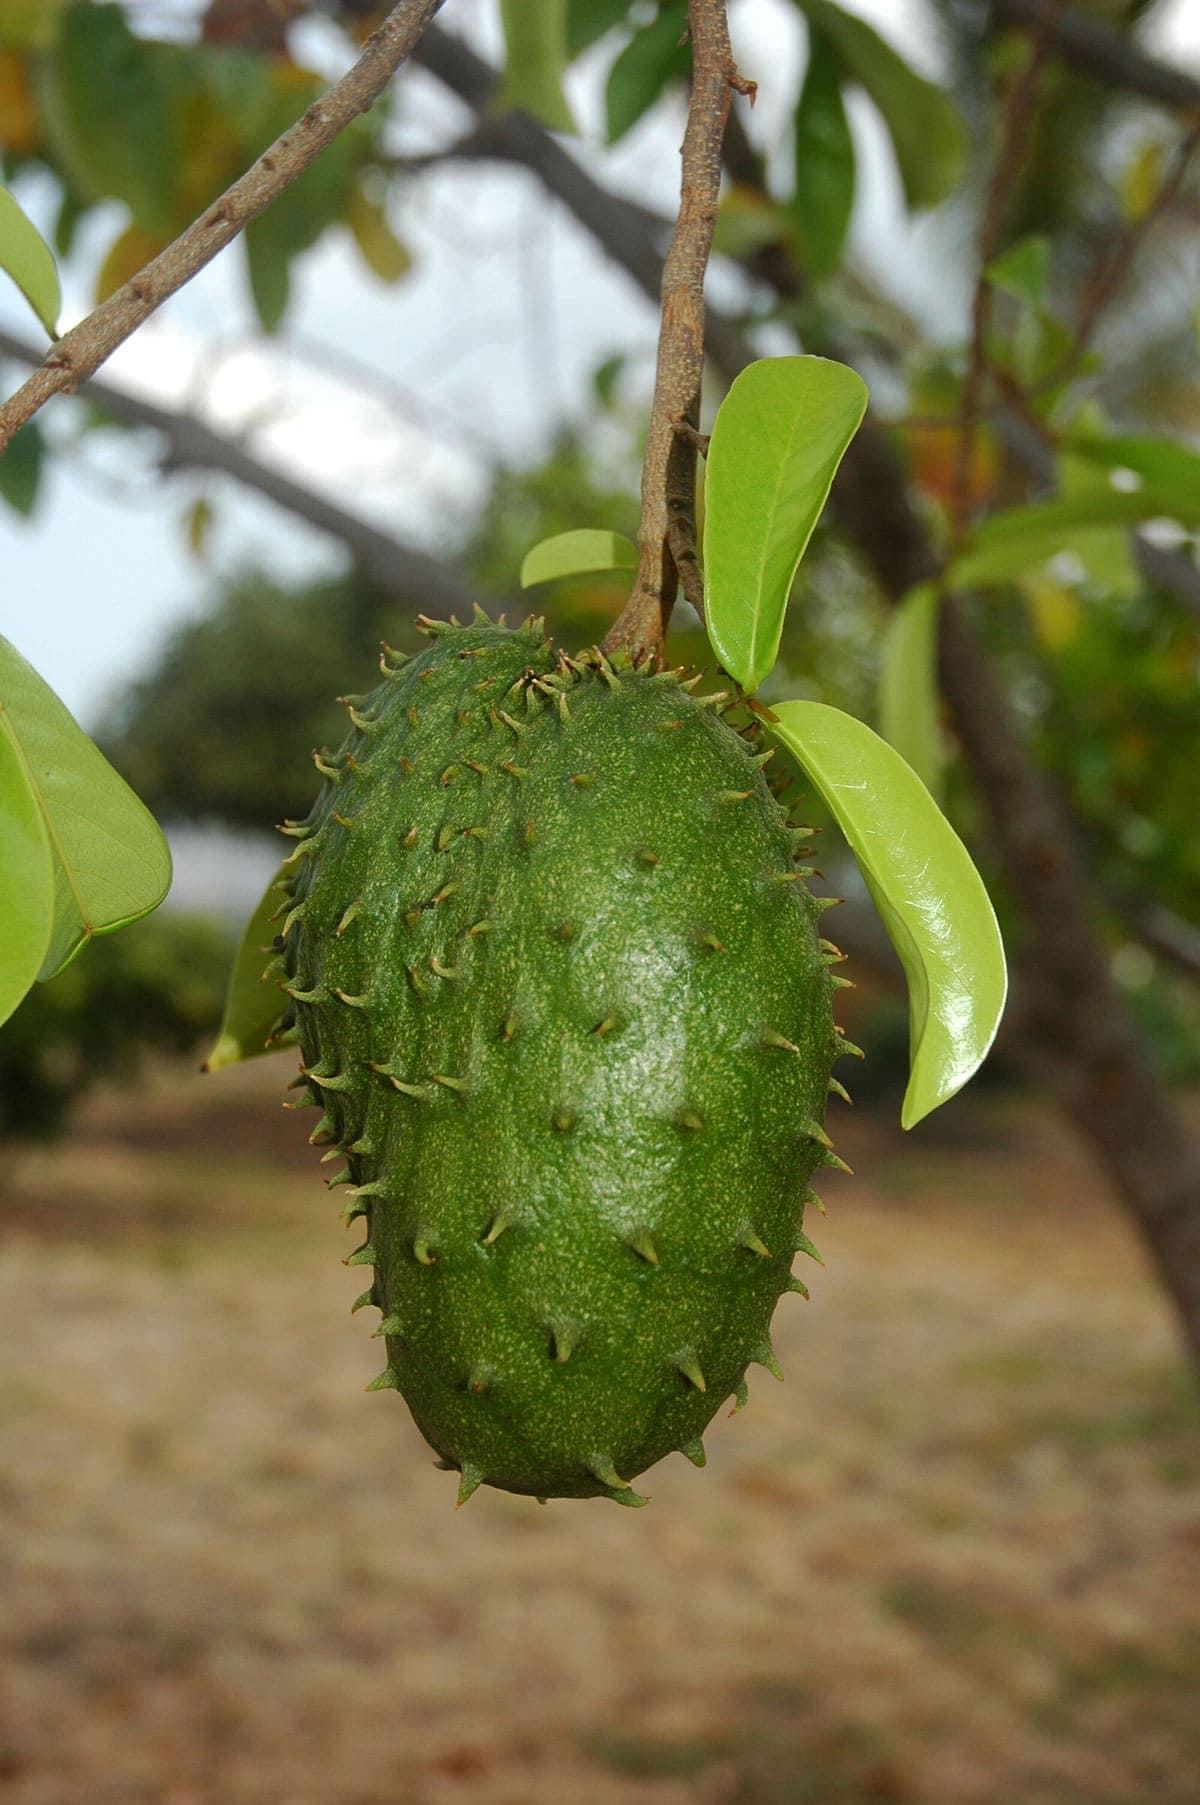 soursop on a tree